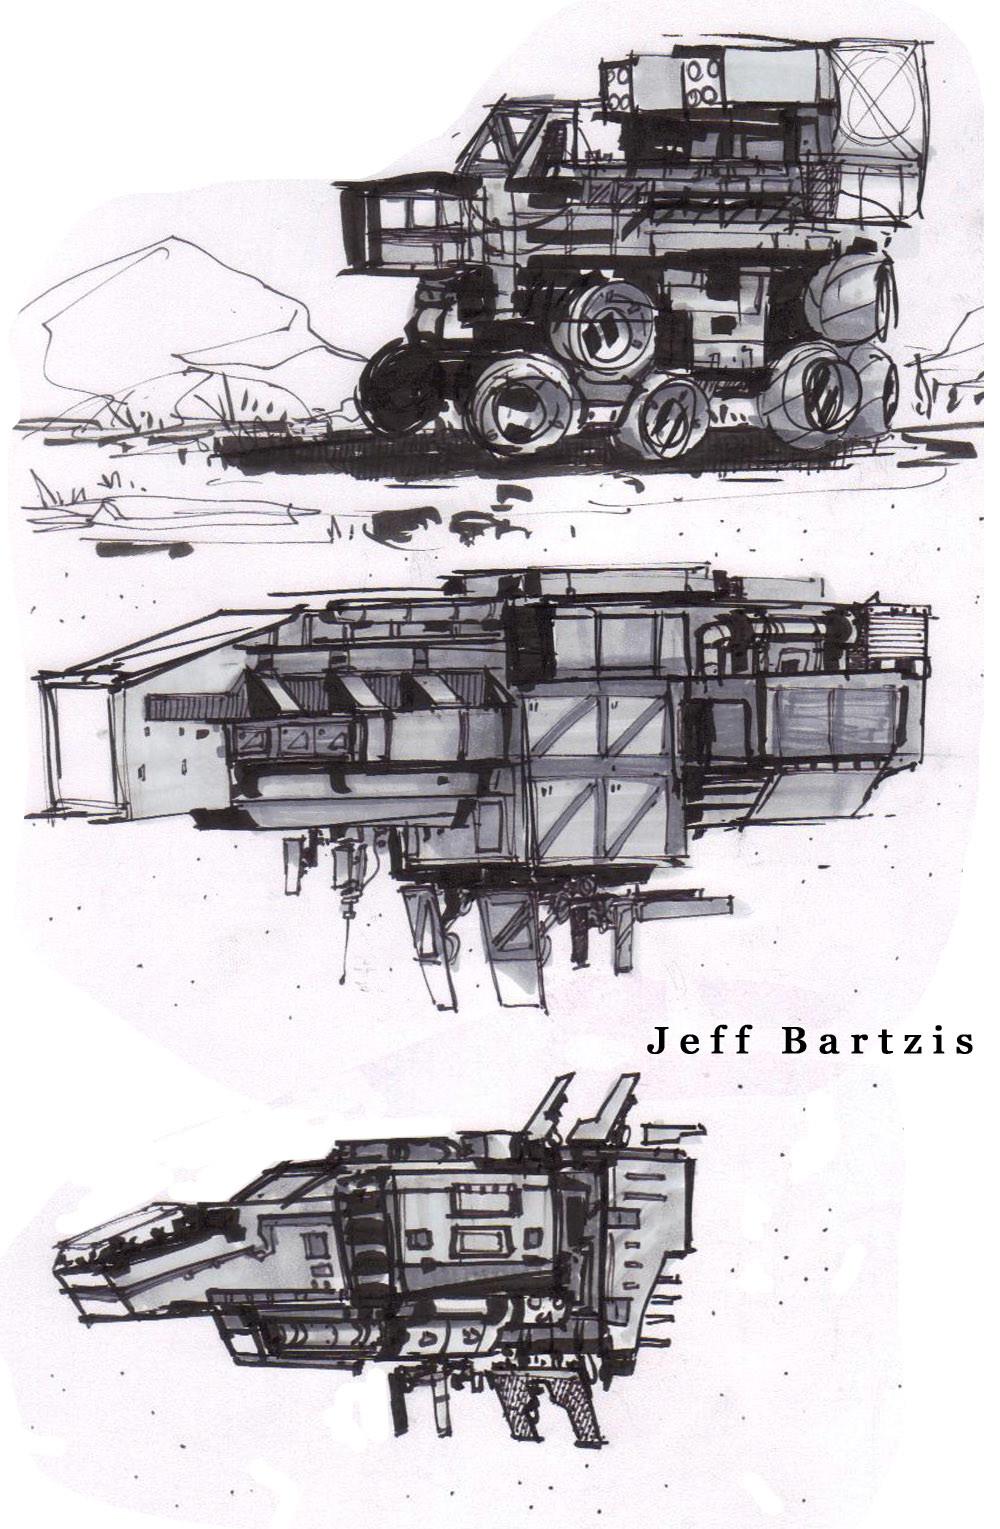 Jeff bartzis sketchbook stuff 031